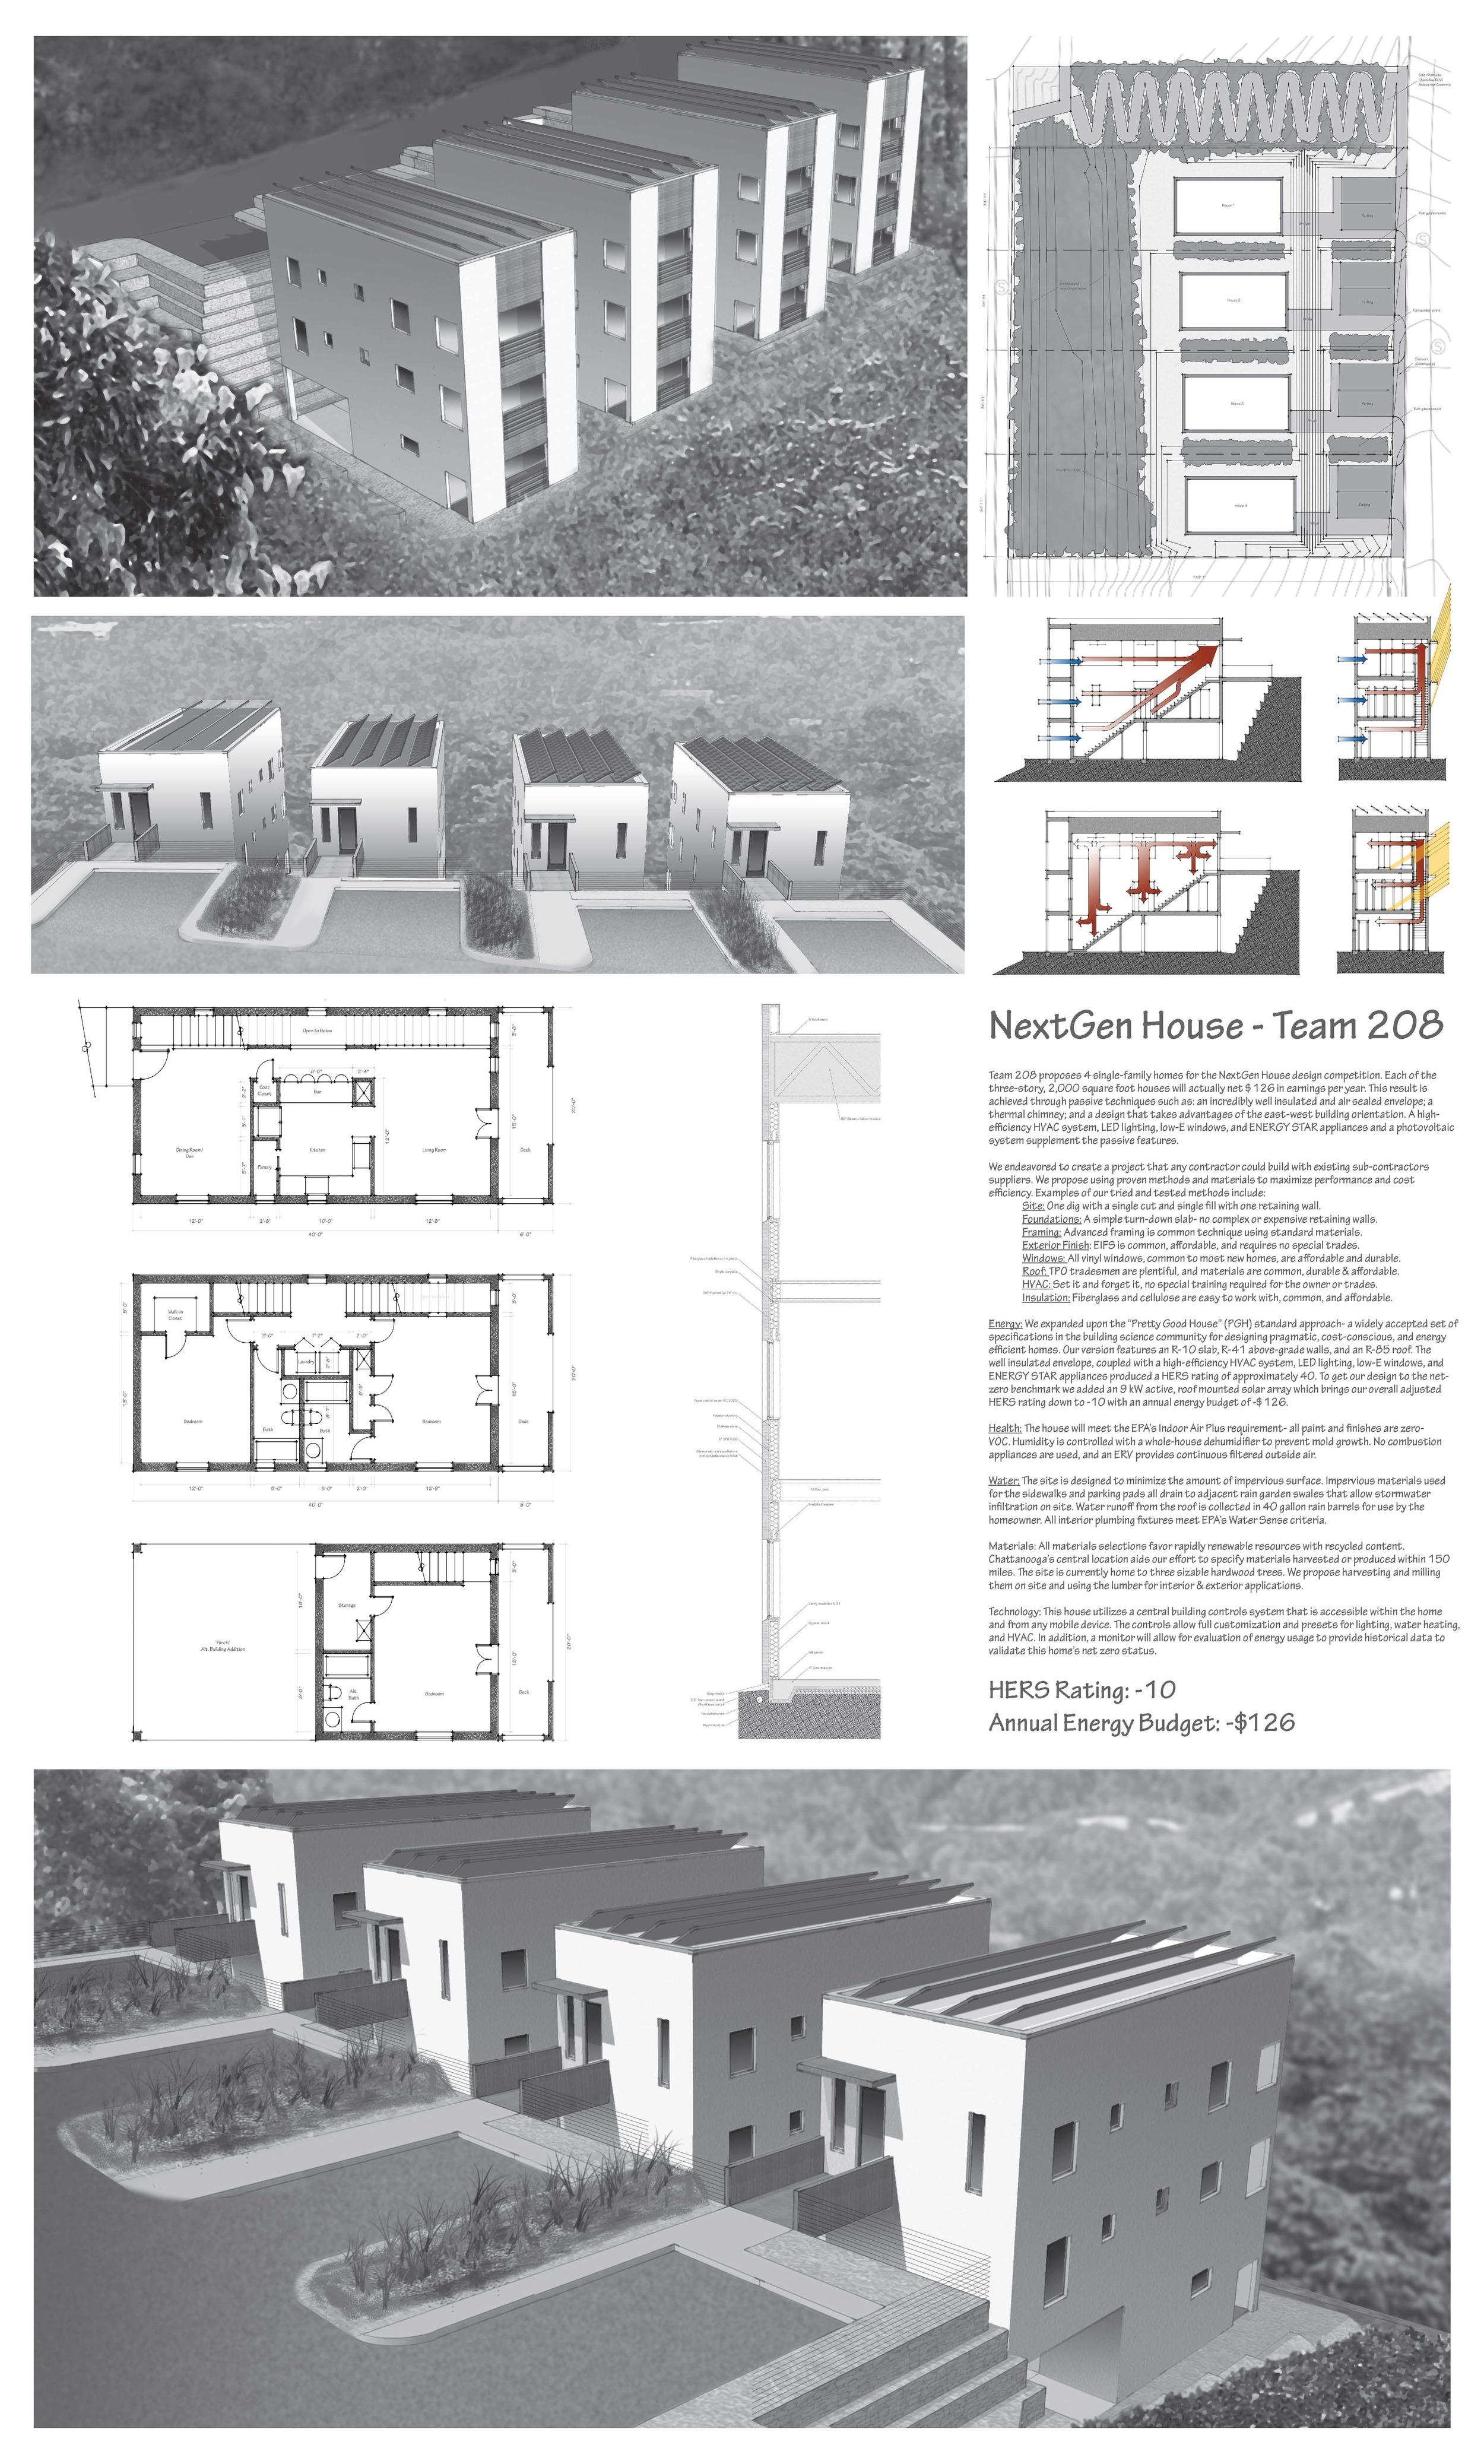 Studio C. Rushing: Christian Rushing; Elemi Architects: Eric Myers; EES Consulting: Chris Sarine